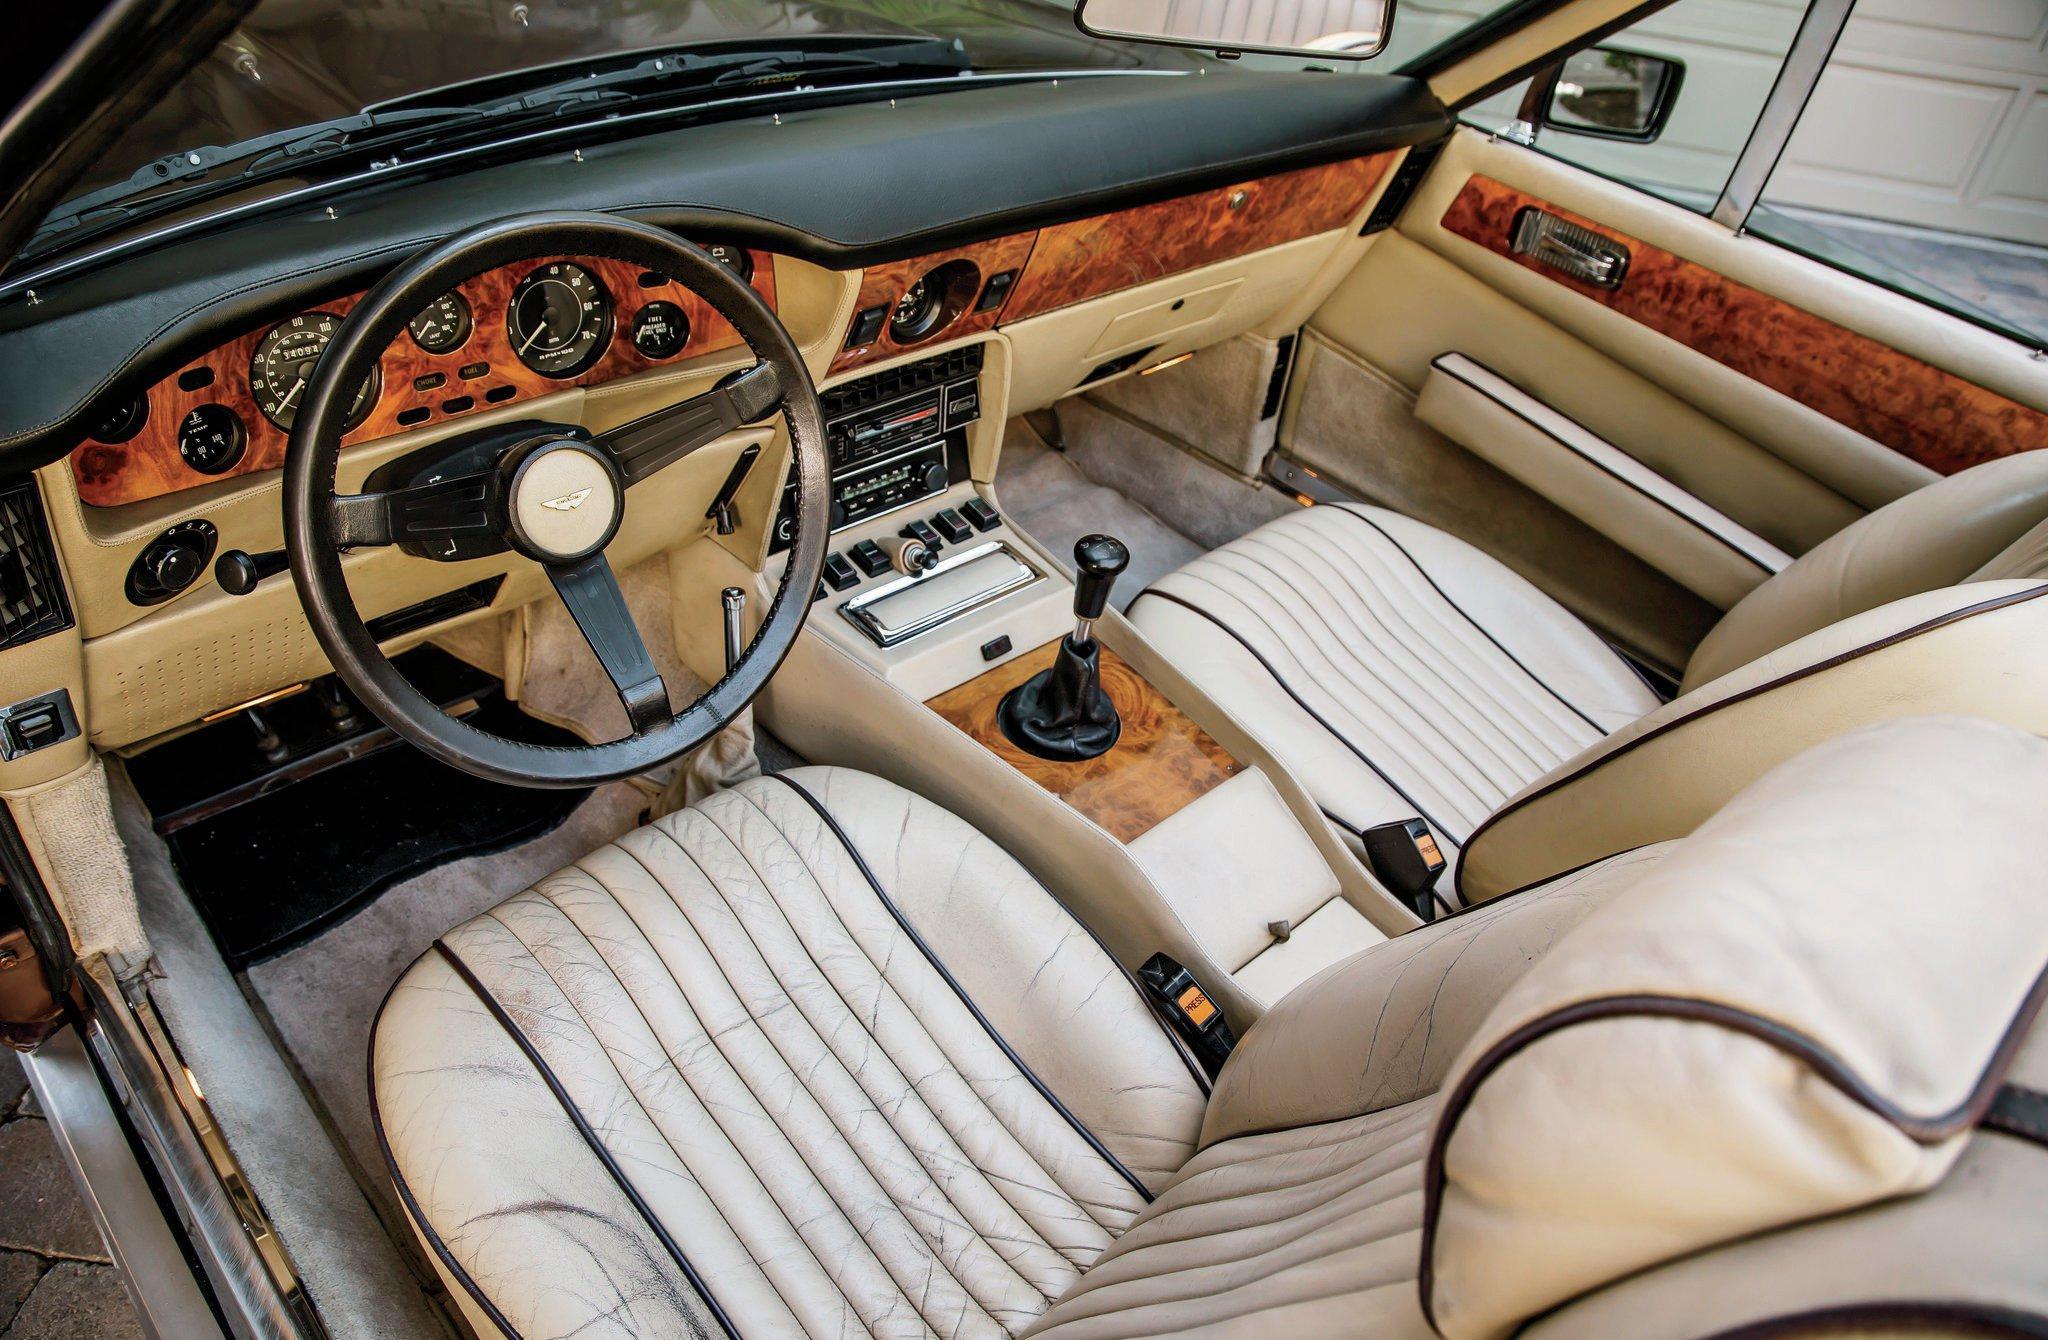 aston martin v8 vantage 1977 interior. the 1979 aston martin v8 vantage 1977 interior